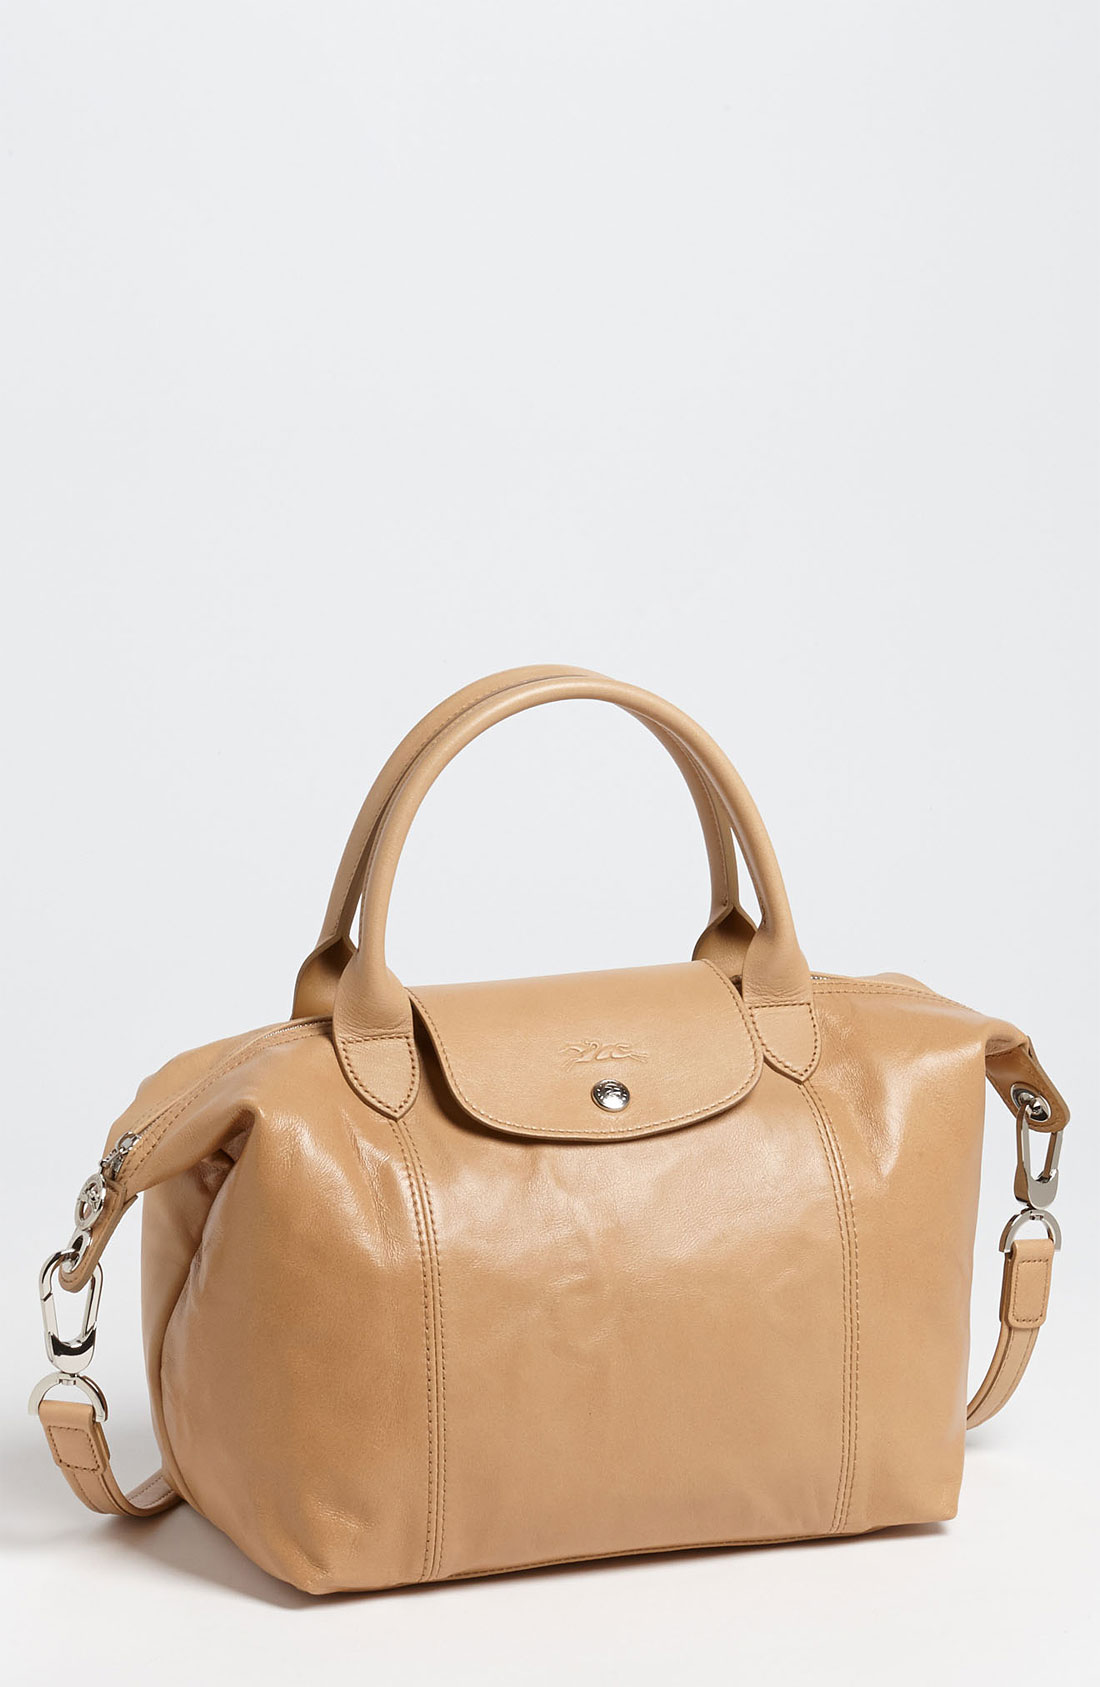 Longchamp Le Pliage Cuir Leather Handbag | IUCN Water